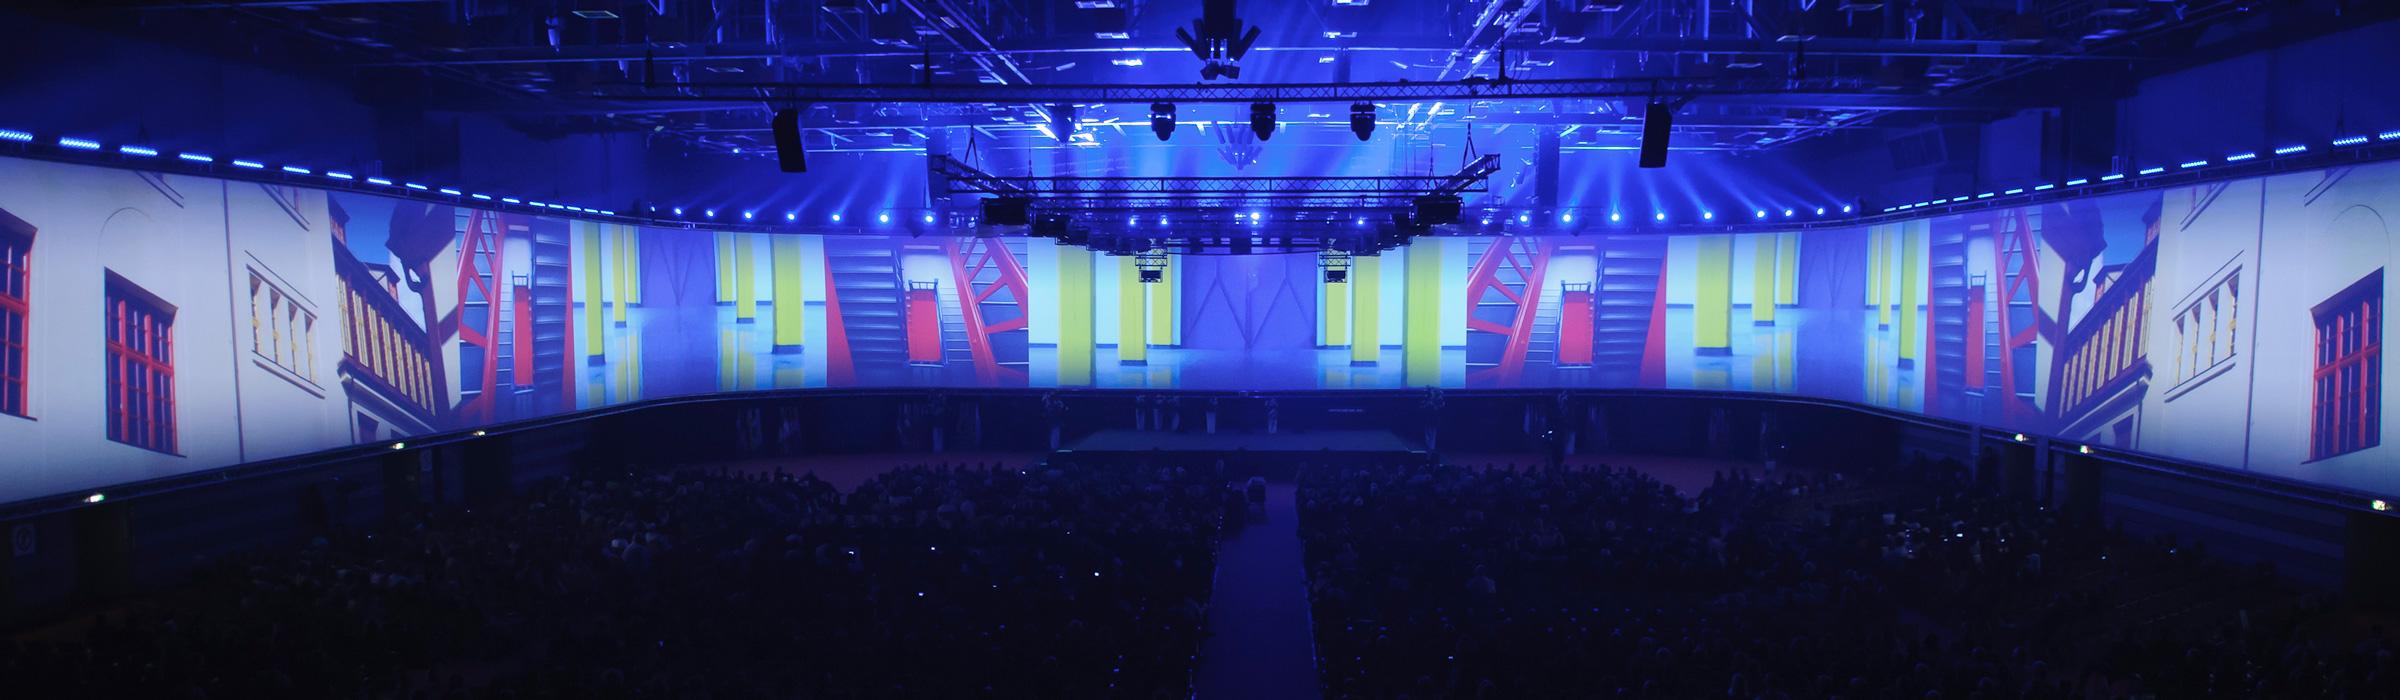 120m lange Projektion für Faber-Castell